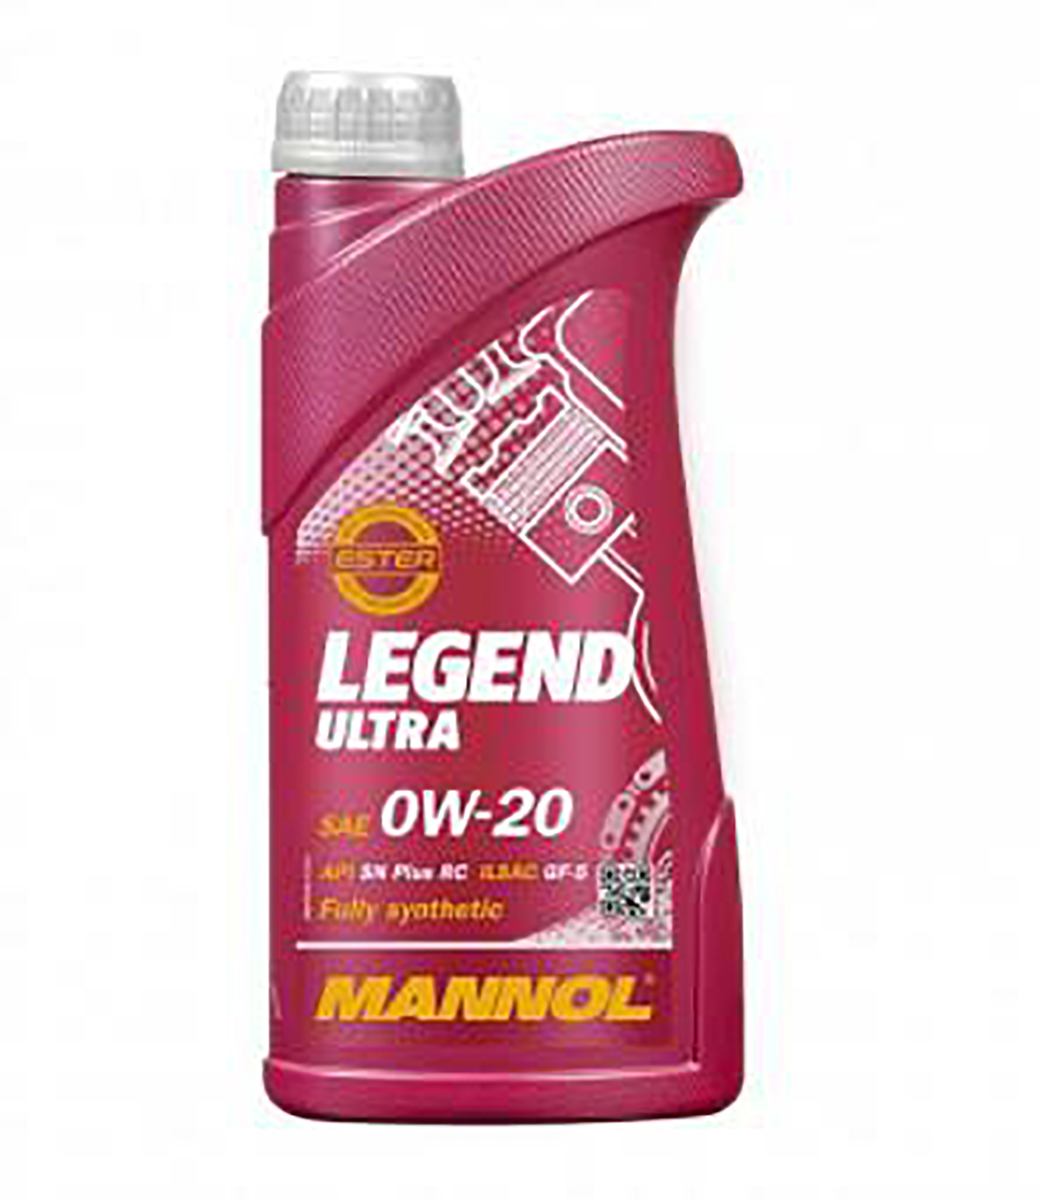 Legend Ultra 0W-20